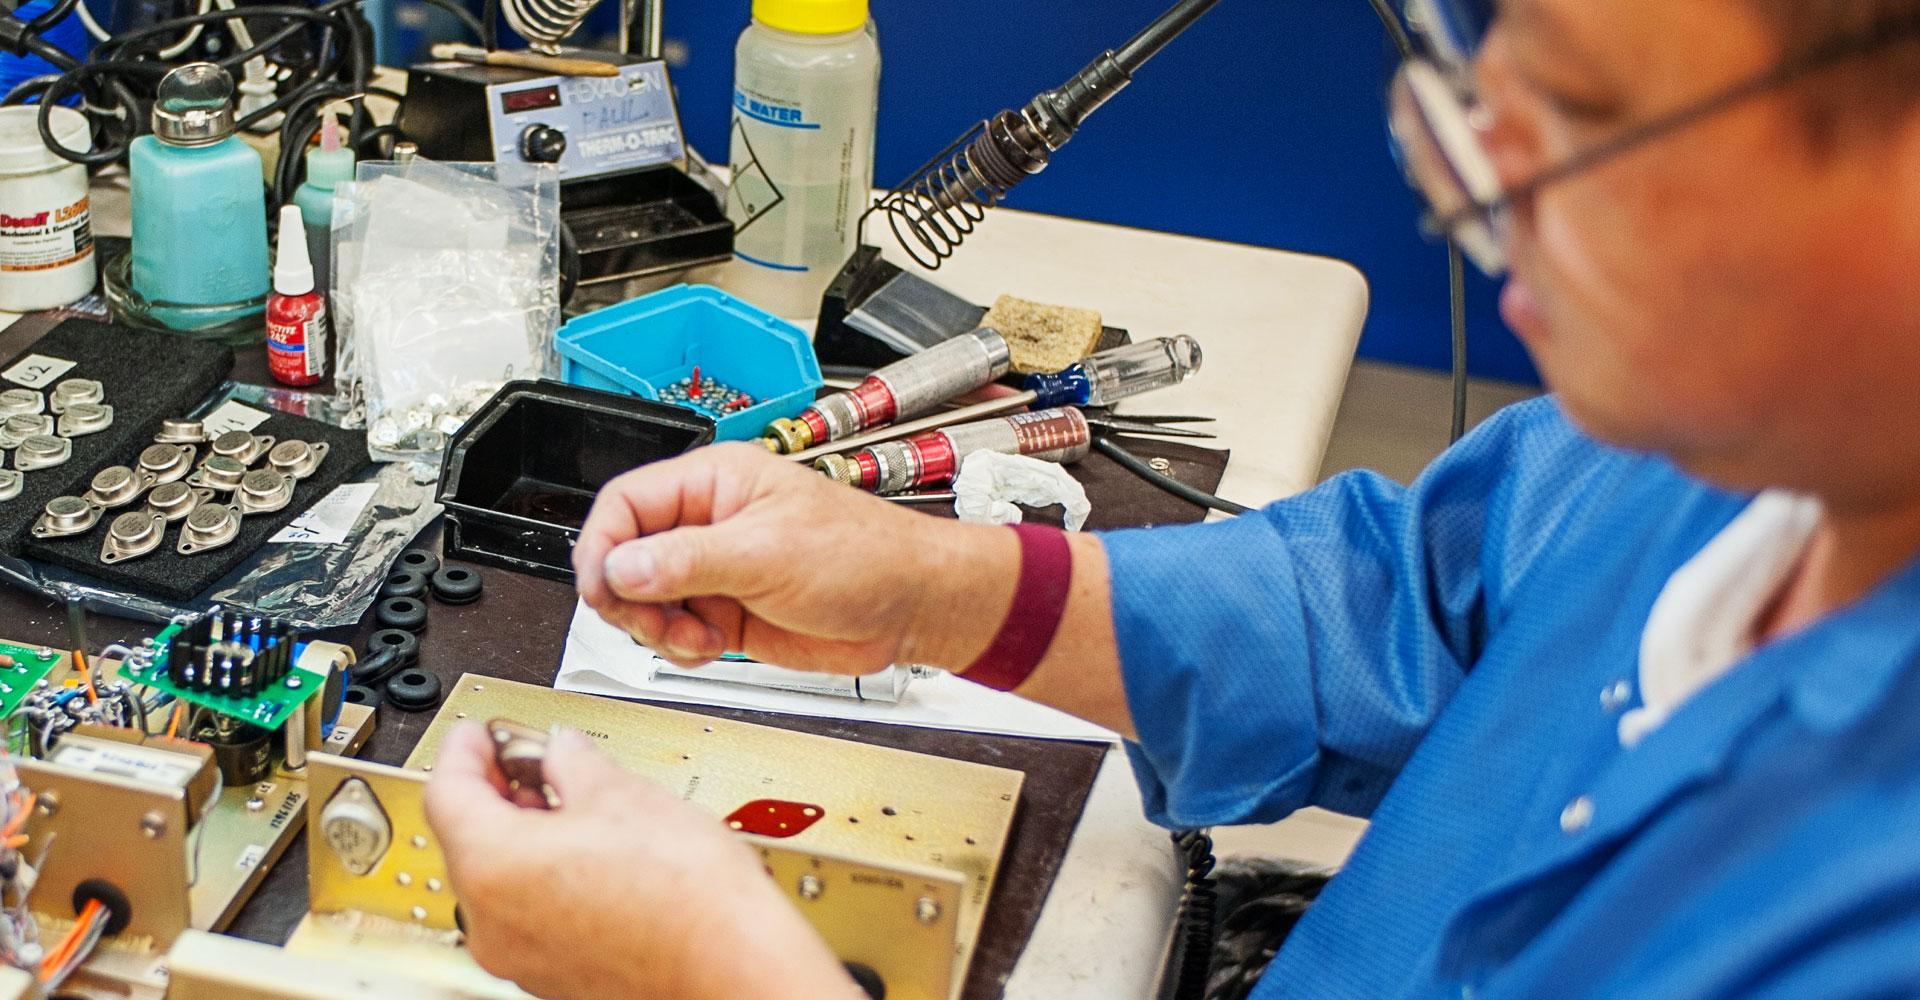 Engineered Magnetics - Aerospace Component Manufacturer: Facility Slide 3